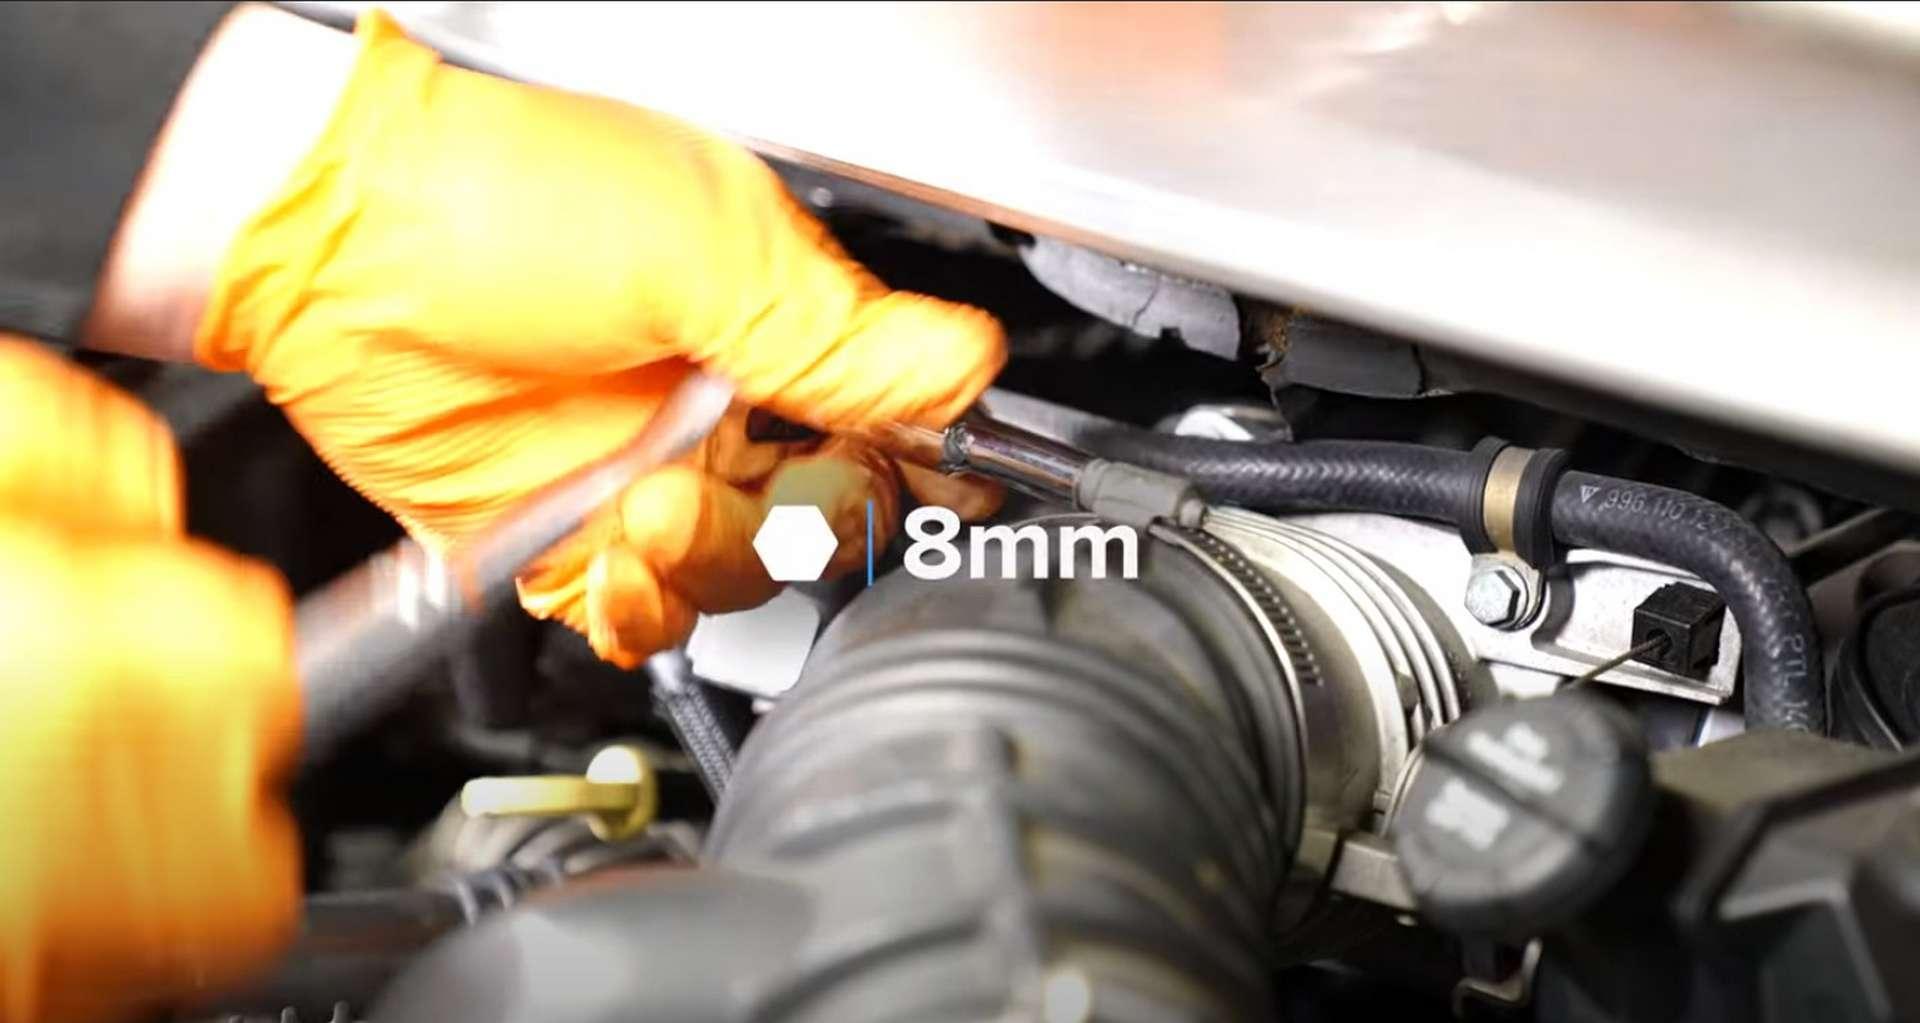 03-DIY-Porsche-996-Engine-Mount-Replacement_Removing_Intake